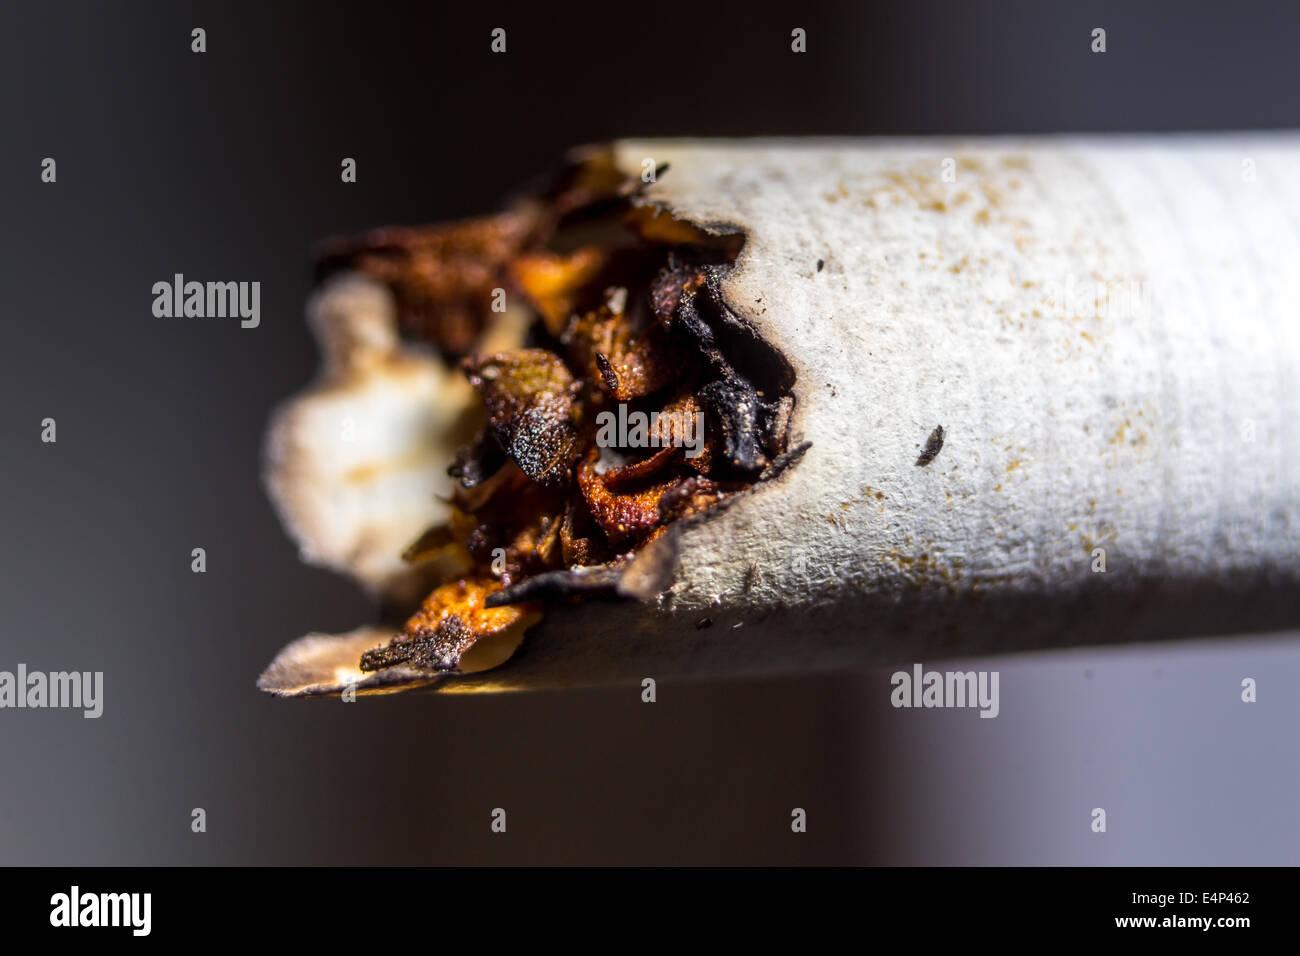 Closeup o ungesunde gerauchte Zigarette Stockbild